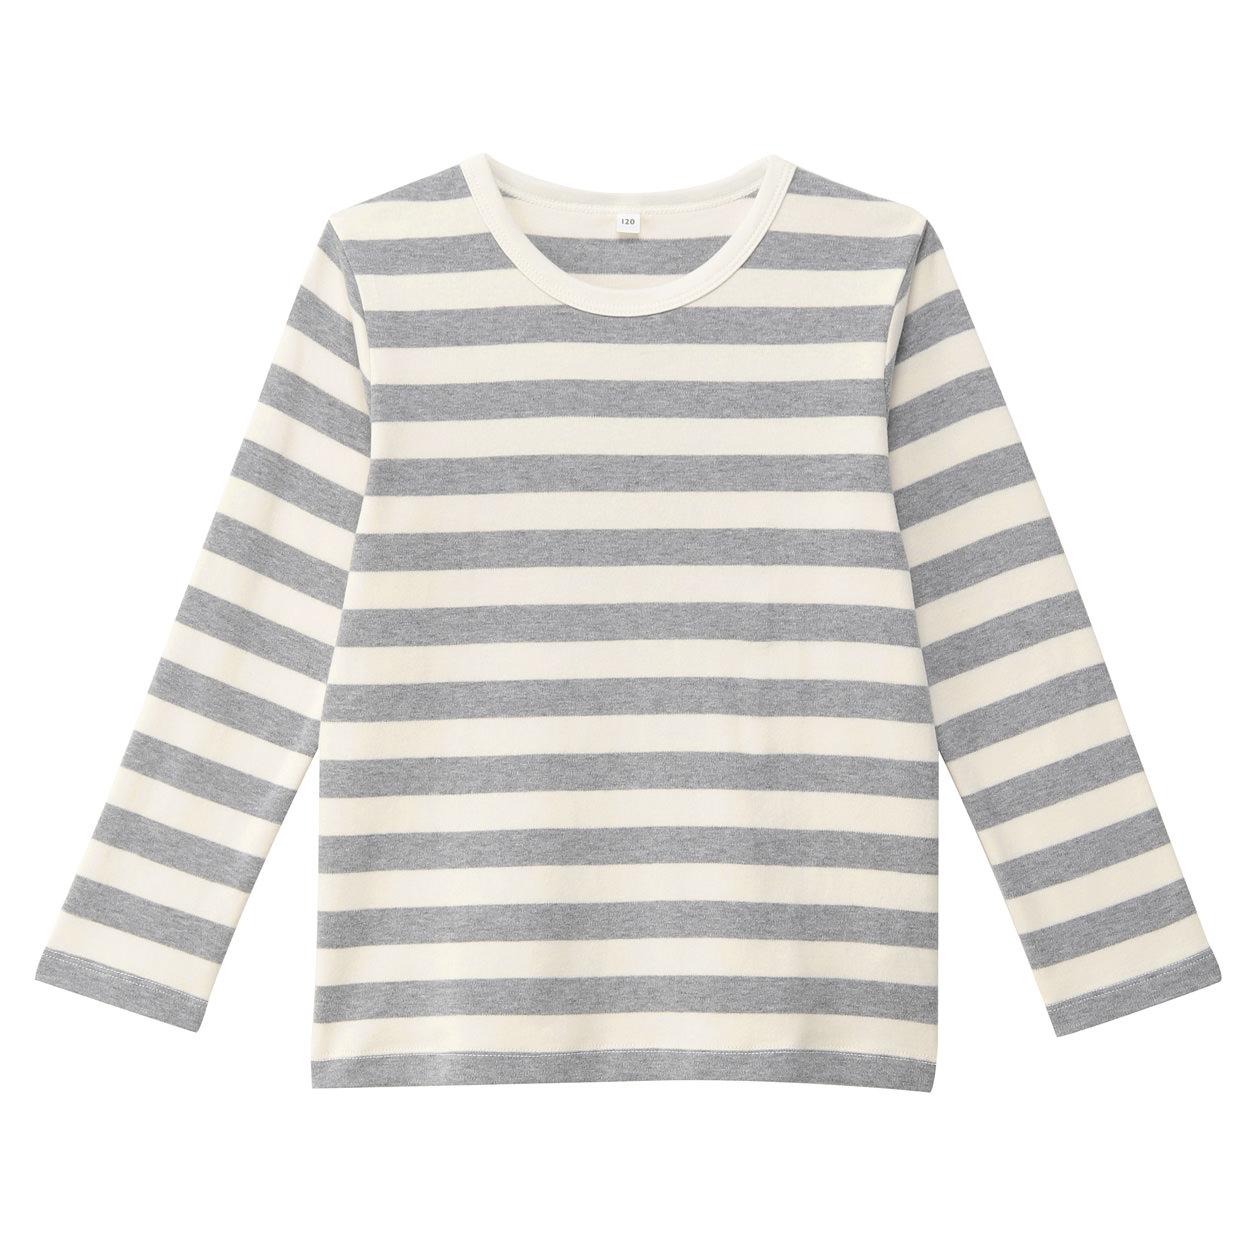 MUJI 无印良品 幼儿长袖T恤 110cm 灰色